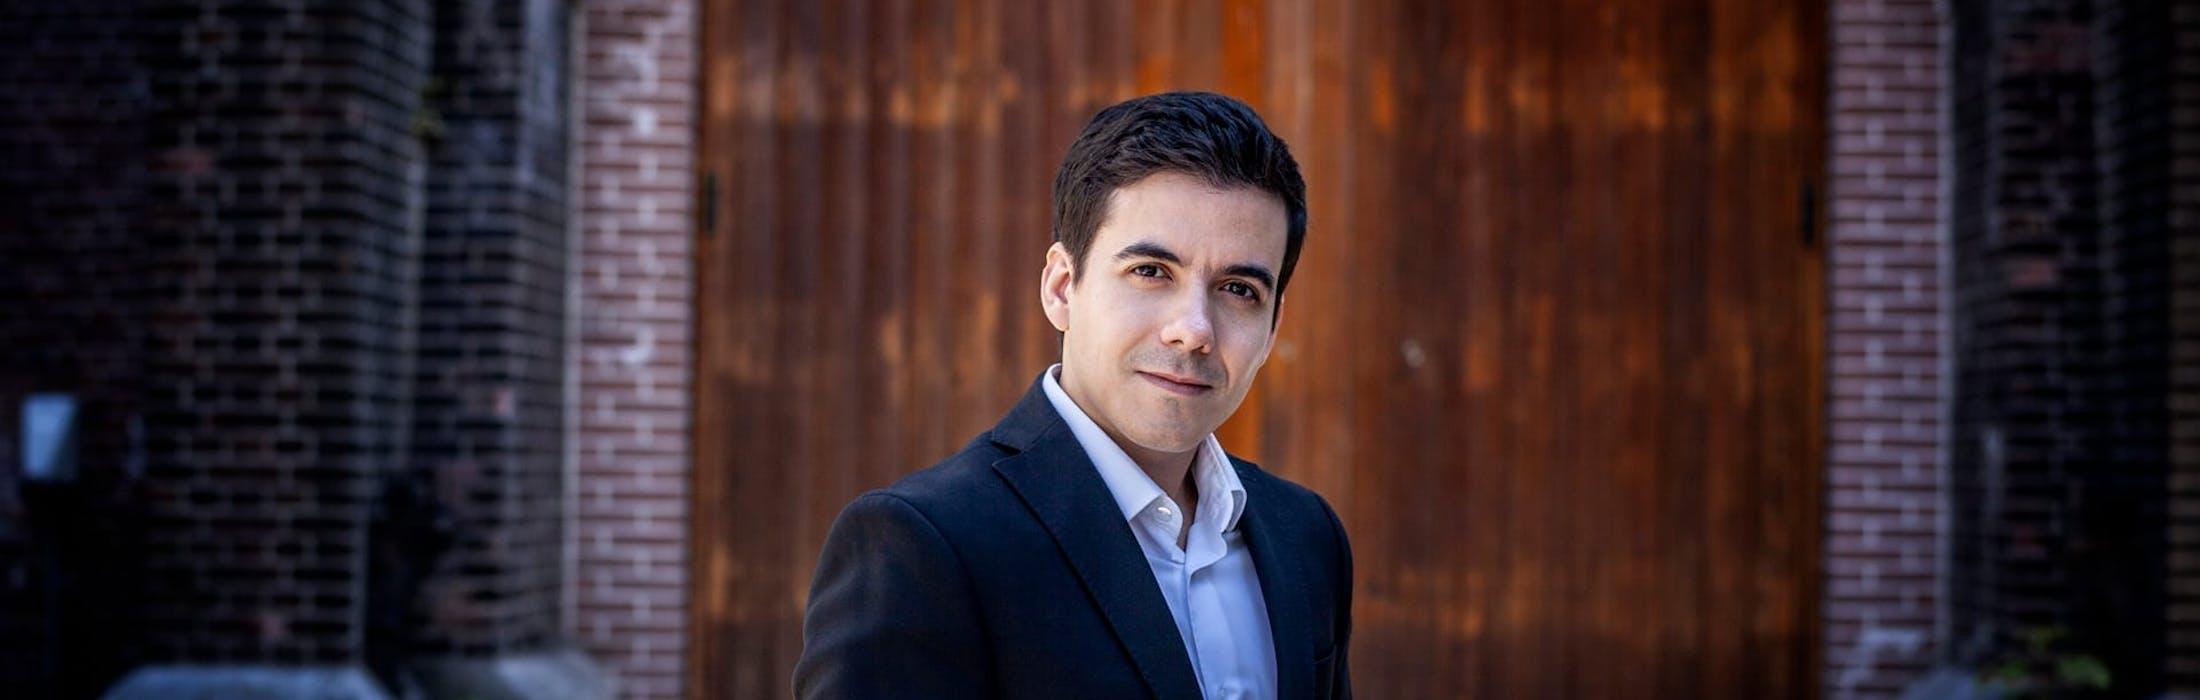 Nuno-Coelho-6-©-Elmer-de-Haas-WEB